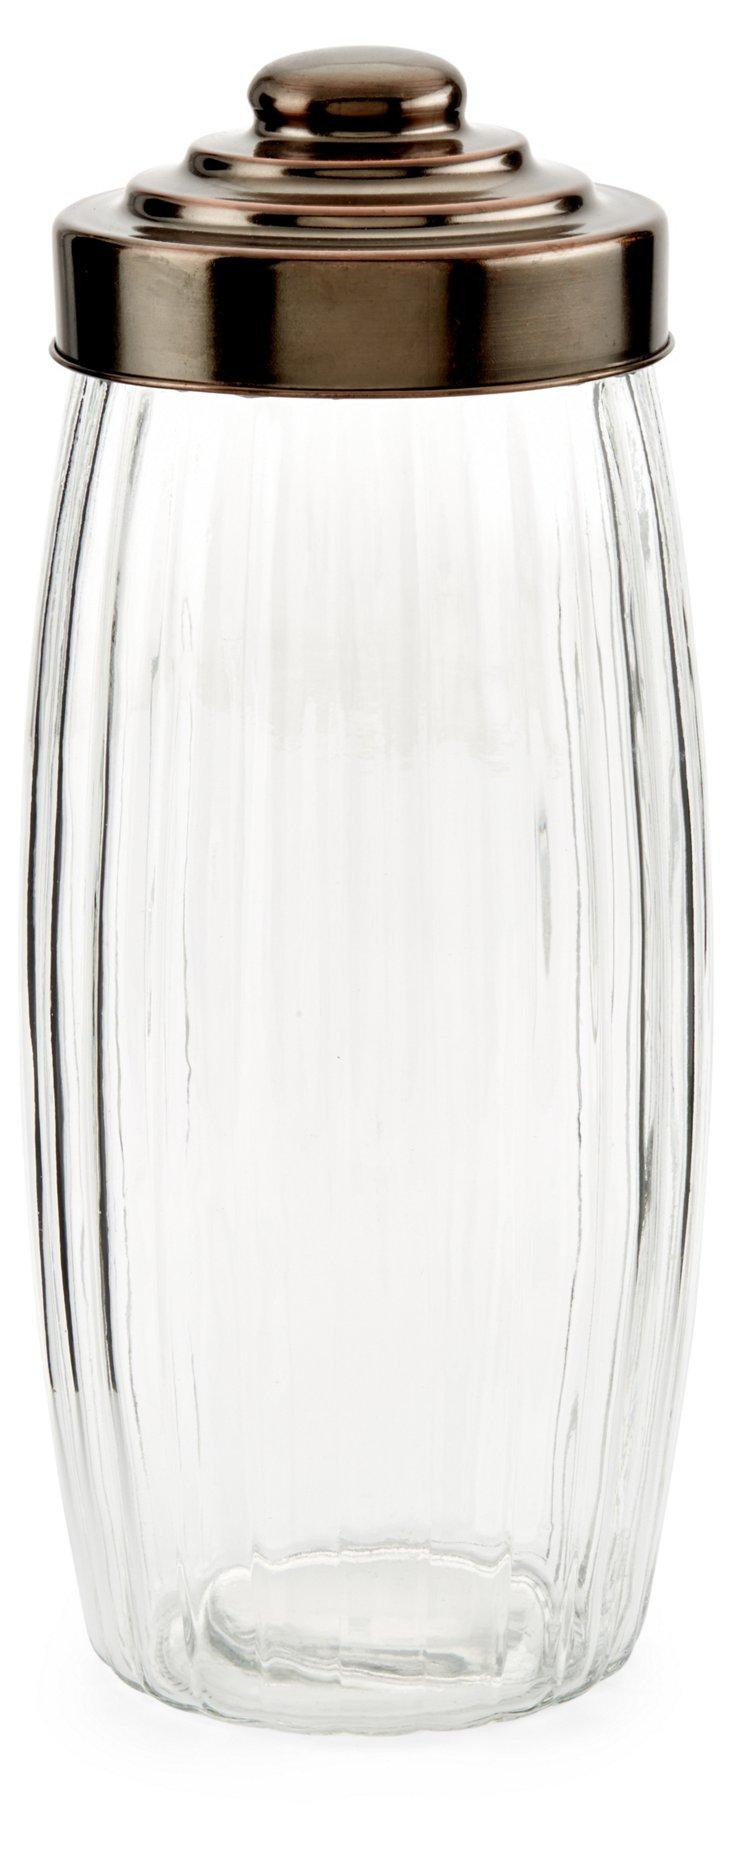 S/3 Copper Lid Jars, 88 Oz